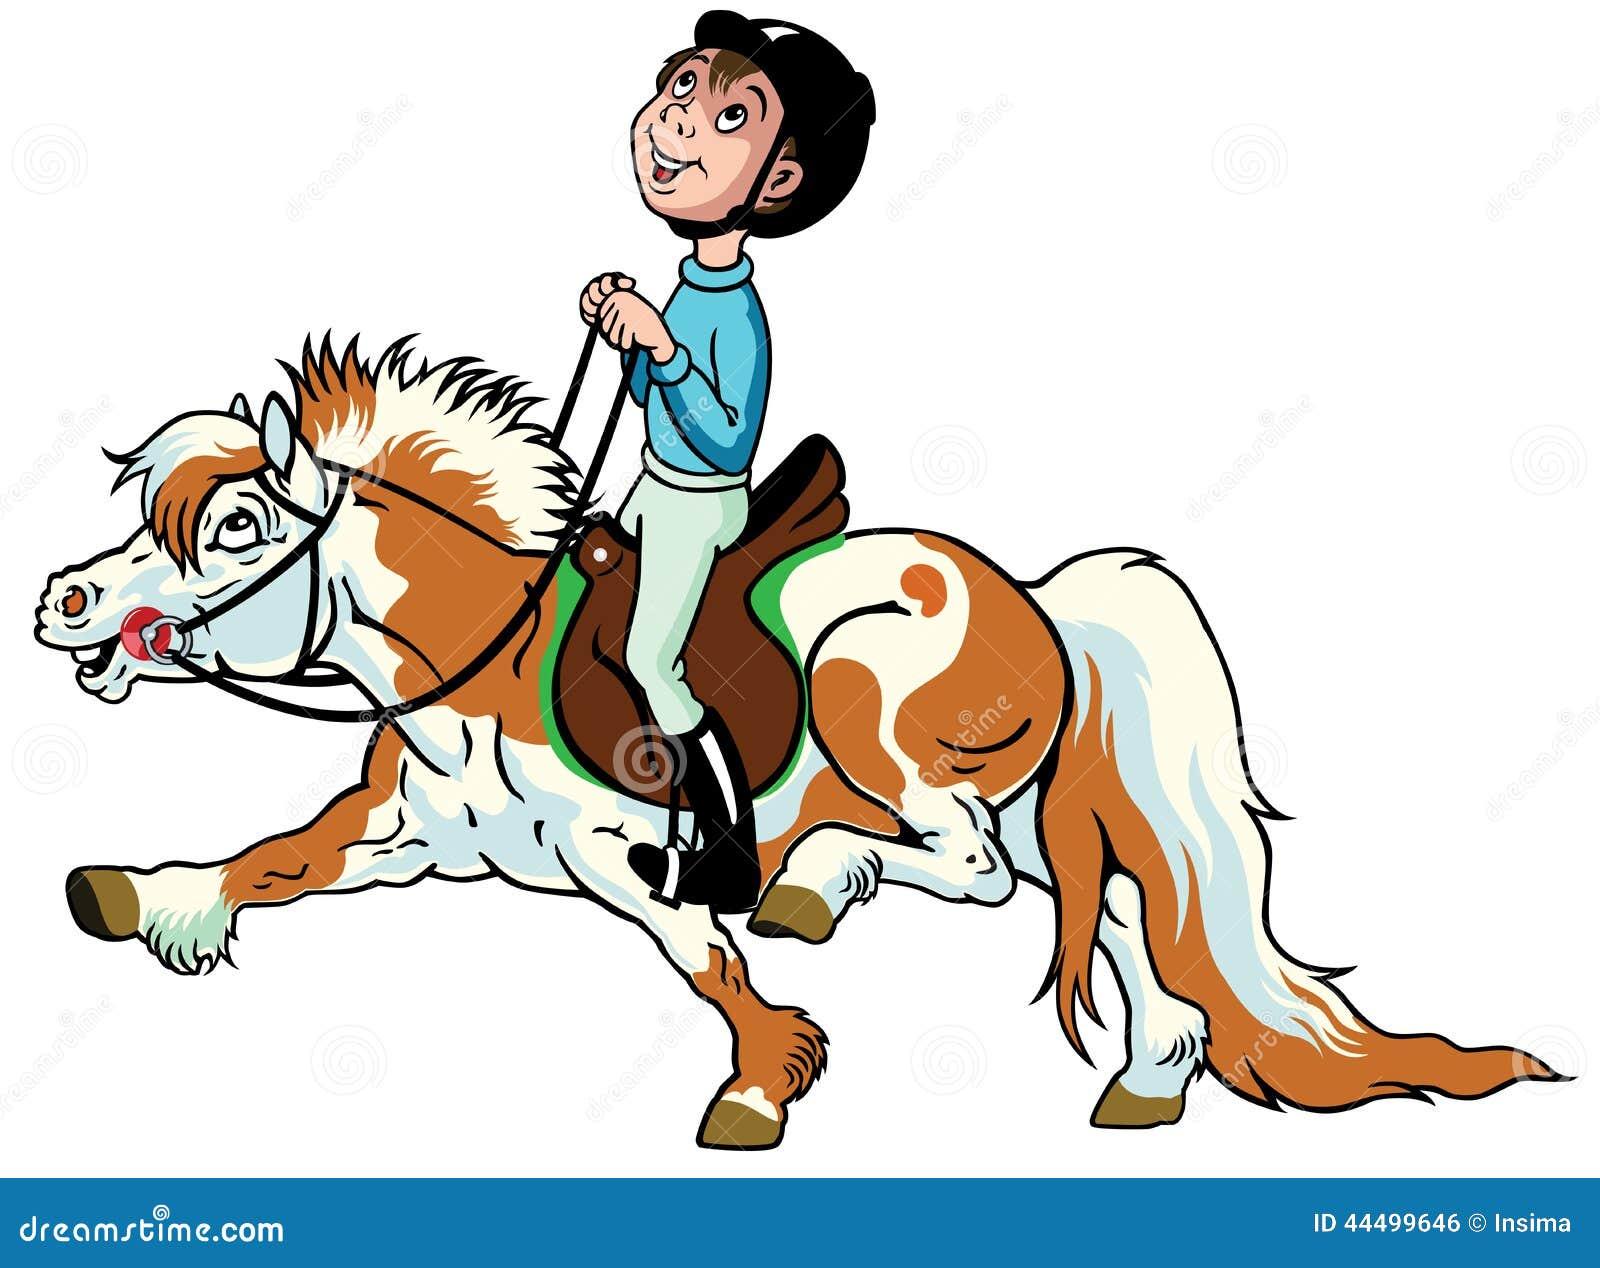 cartoon boy riding shetland pony horse equestrian sport side view image little kids 44499646